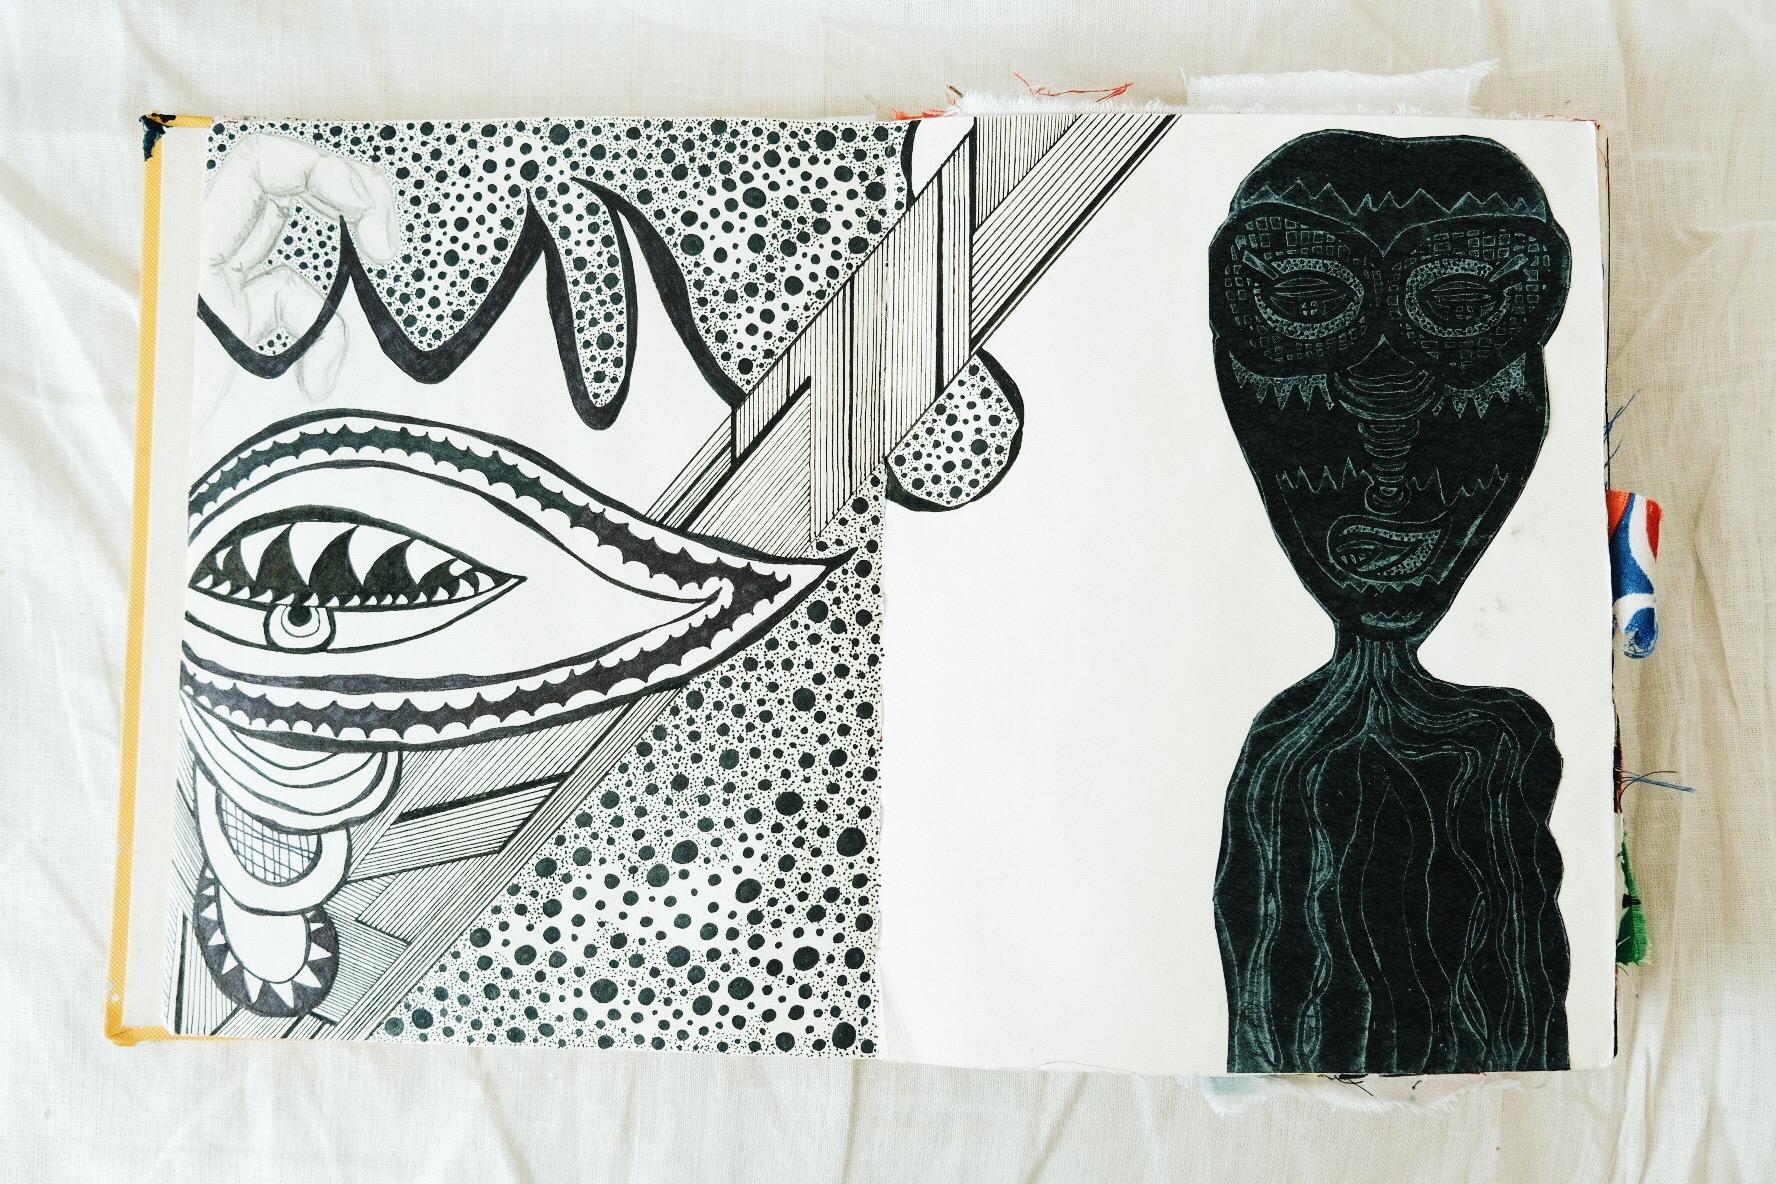 Work of Yasmine Bseiso